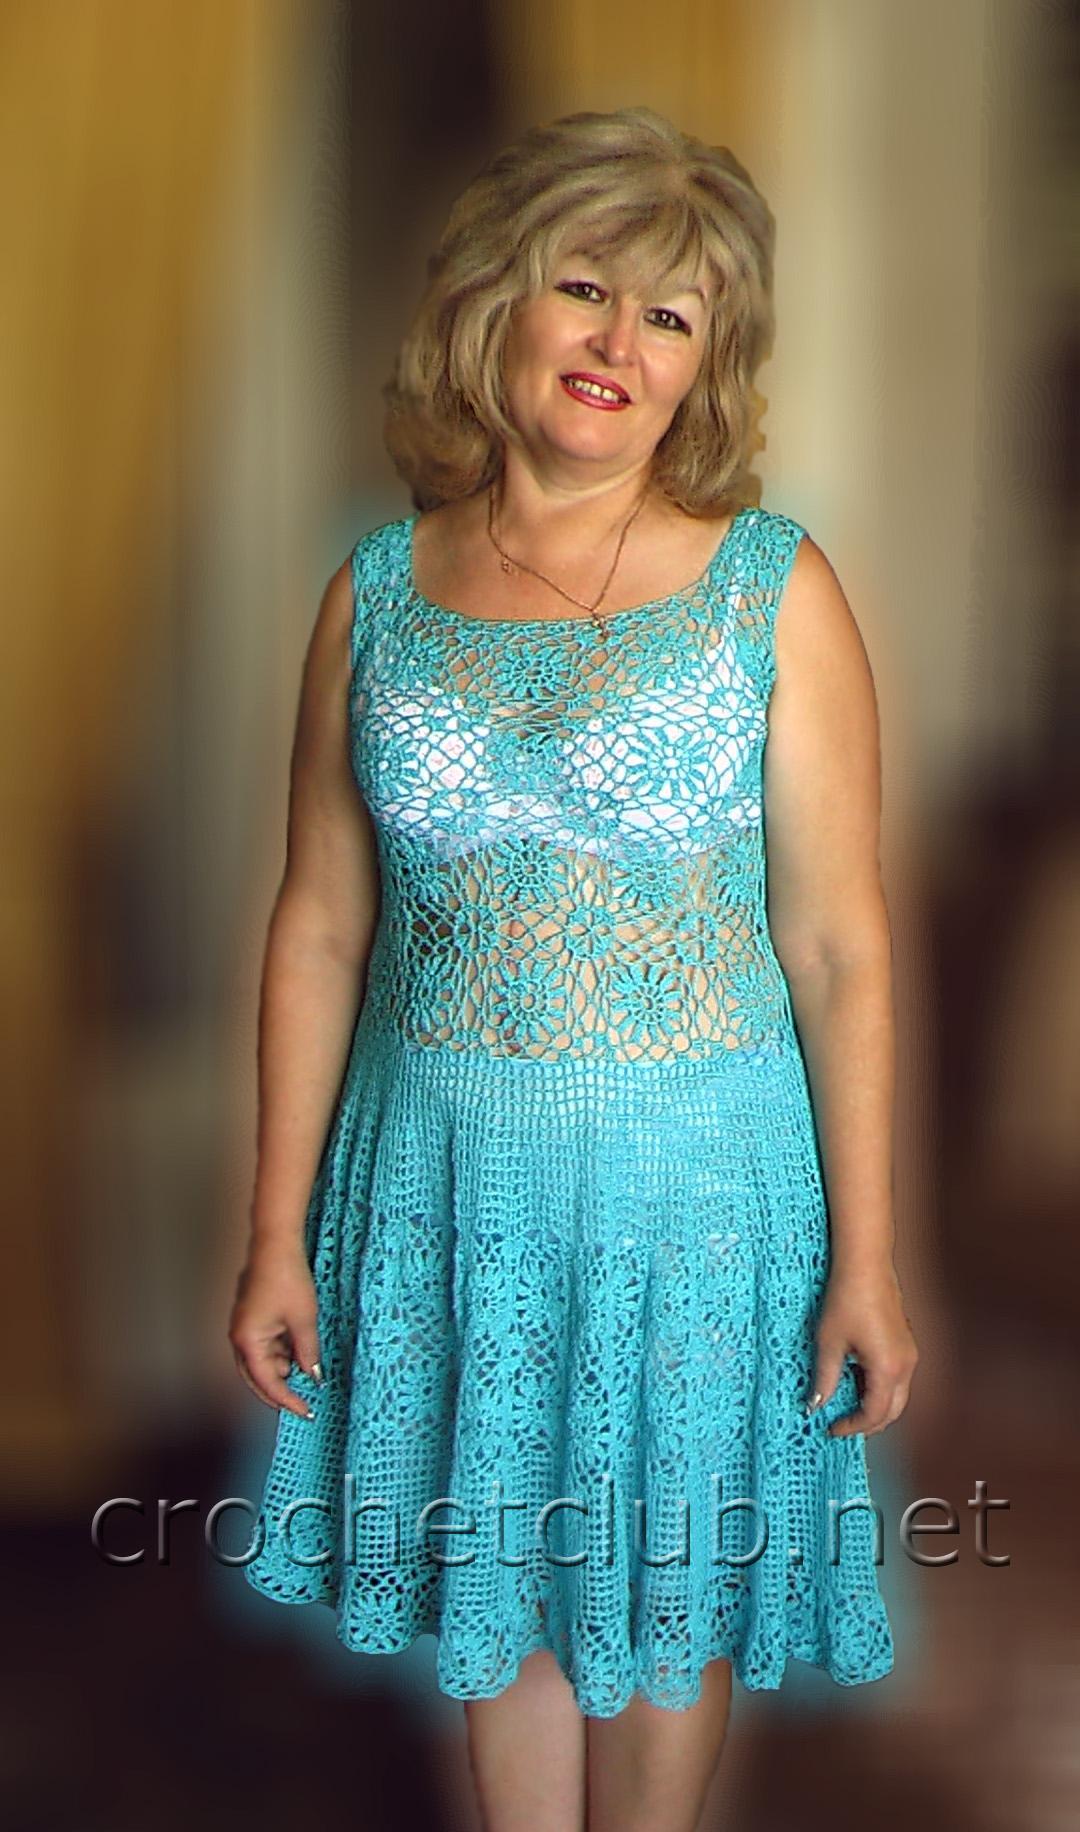 Вяжем крючком платья легко